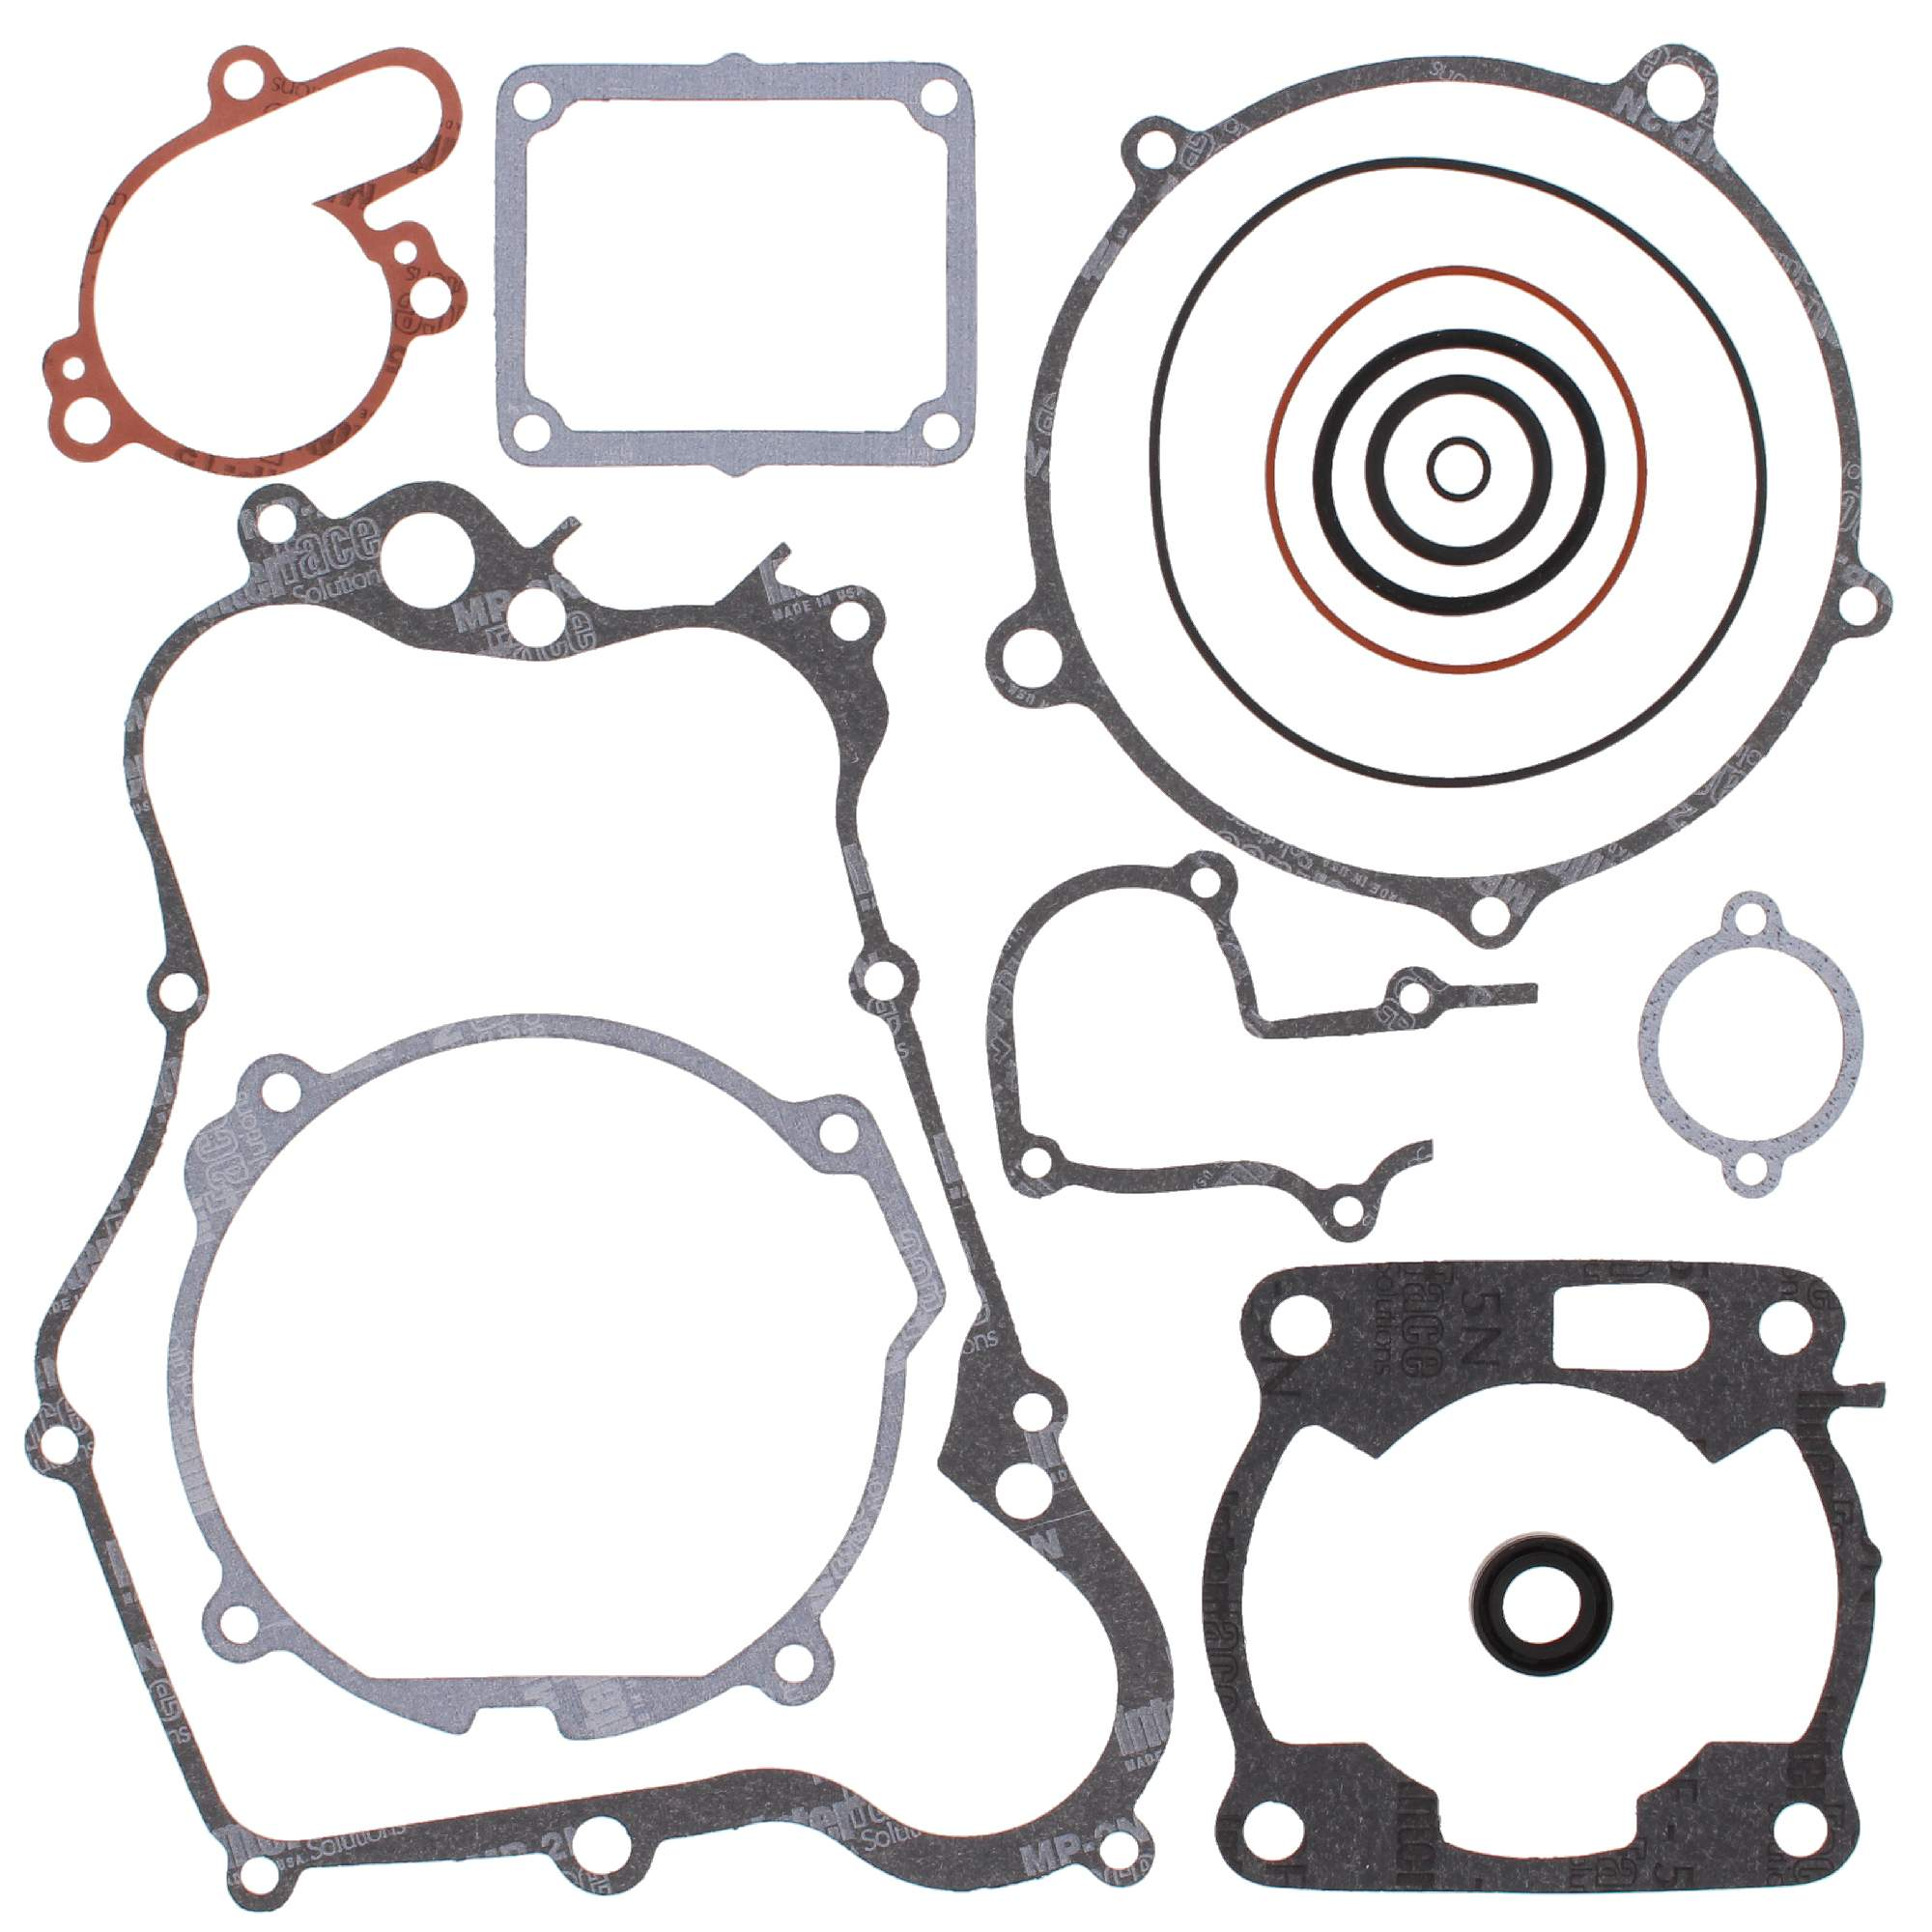 Vertex Complete Gasket Kit For Yamaha Yz125